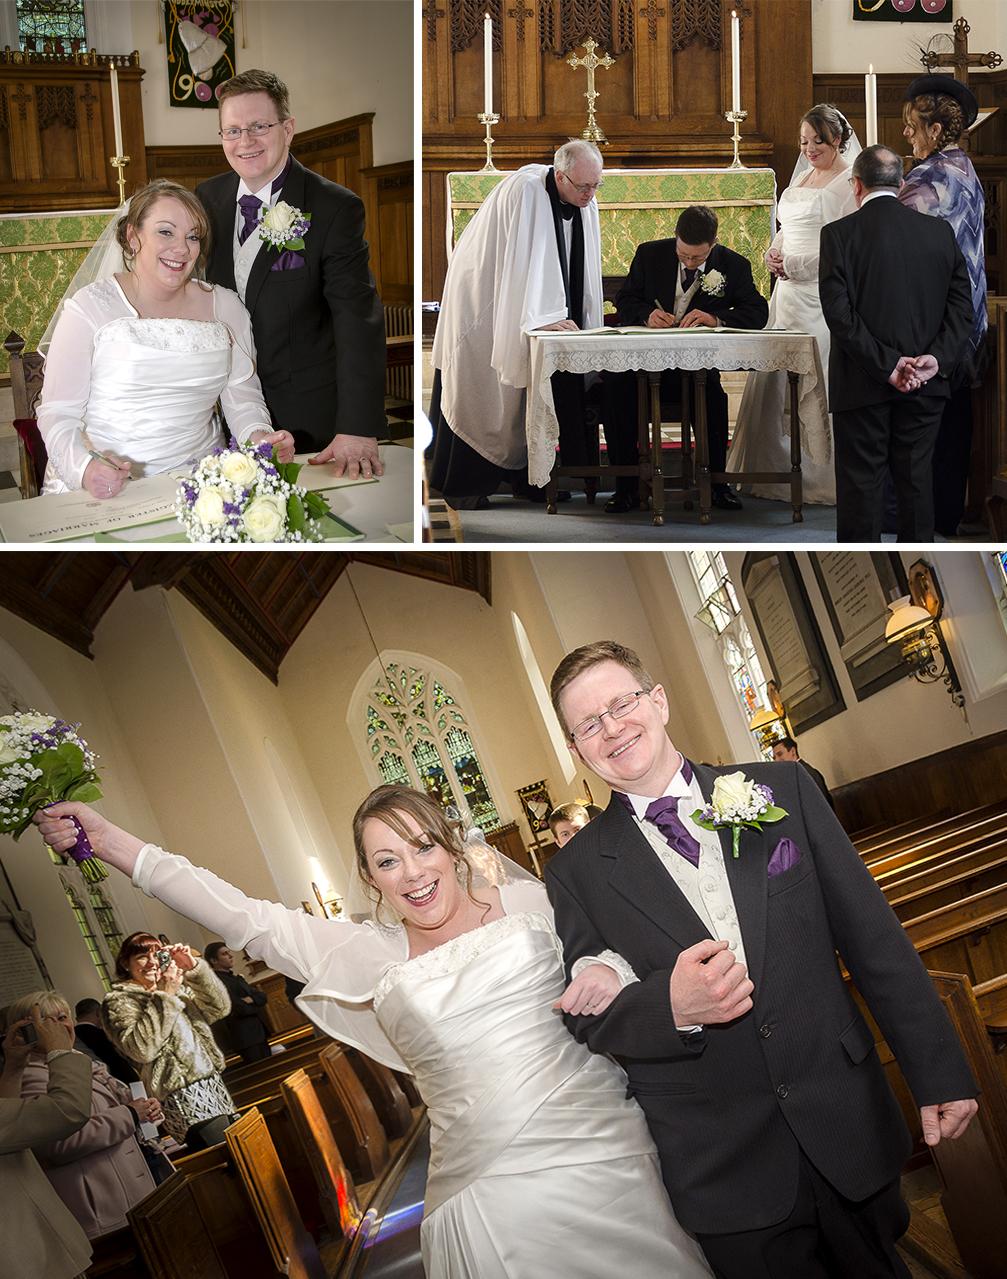 Wedding Photography at St Mary's Church, Stone